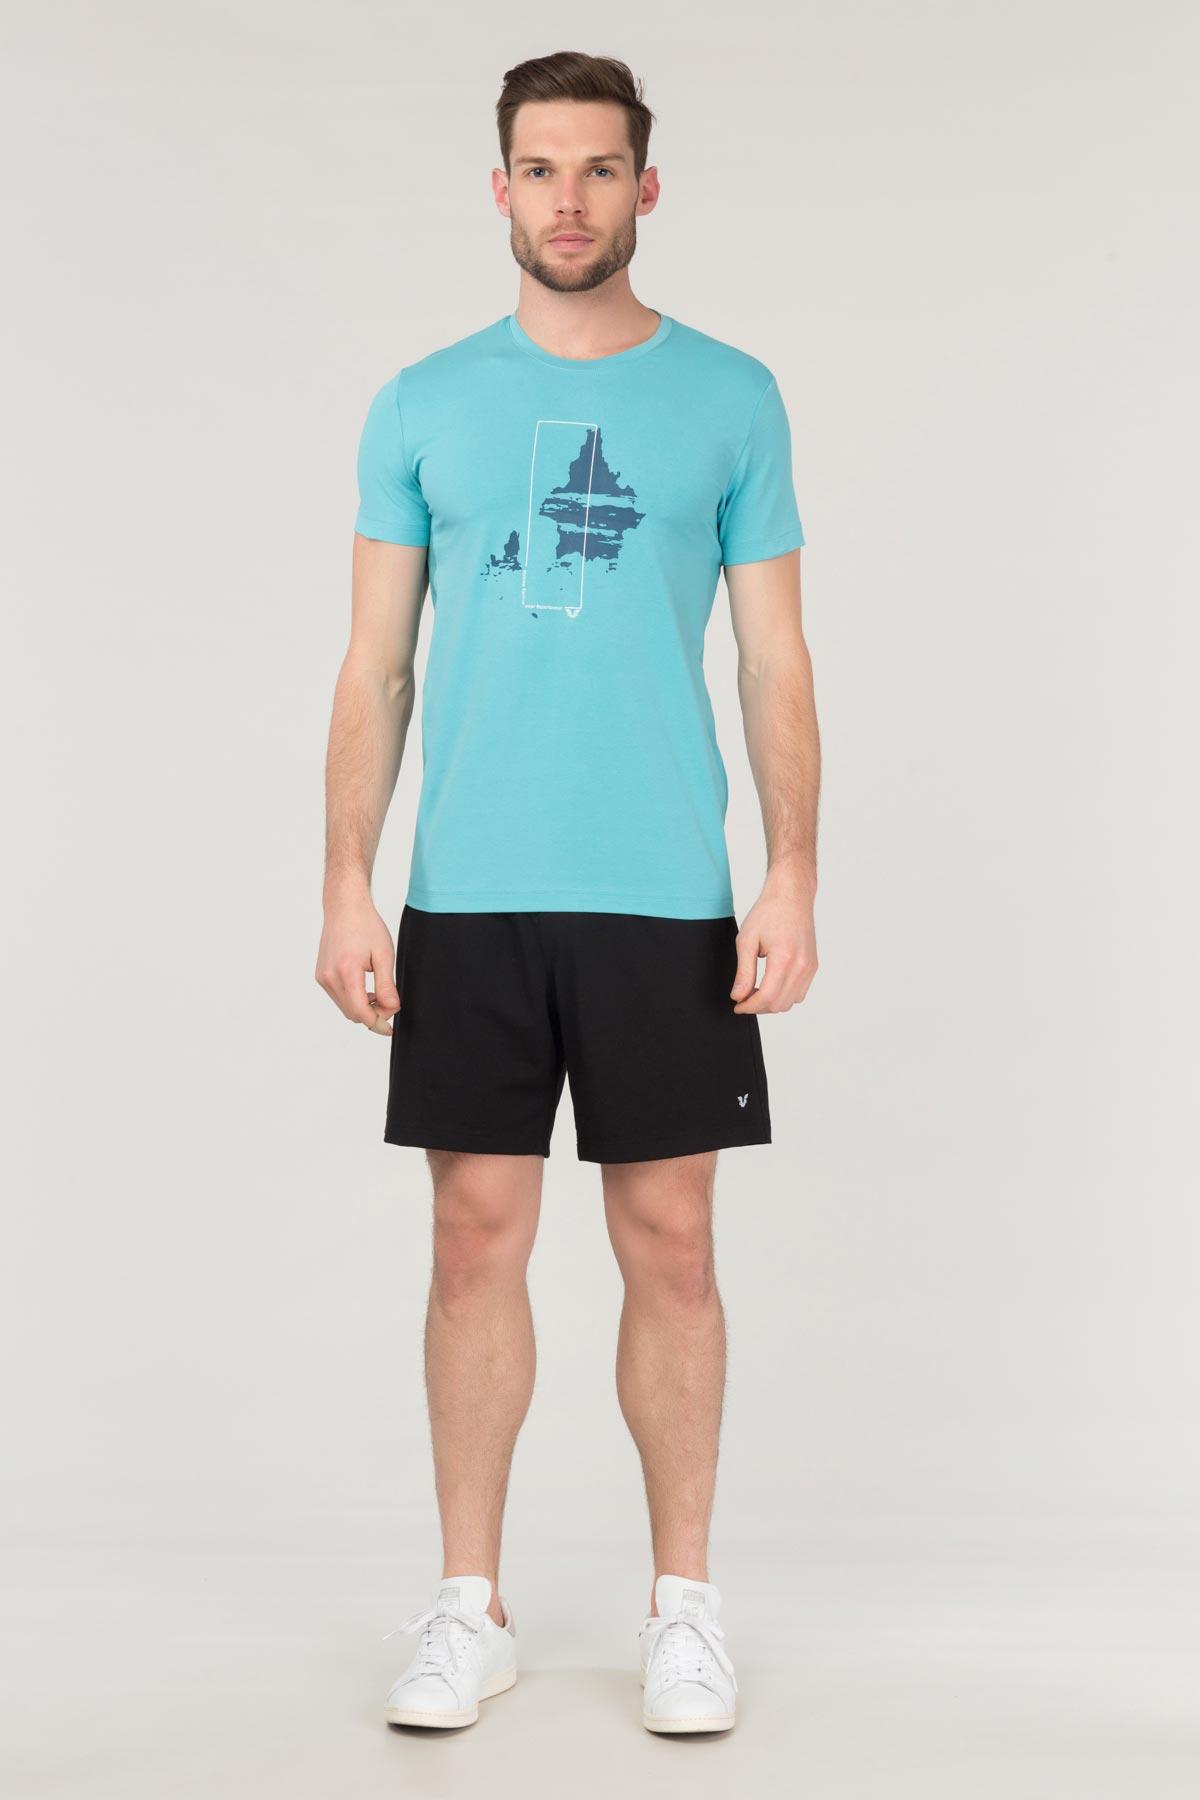 Bilcee Mavi Pamuklu Erkek T-Shirt FS-1682 BİLCEE